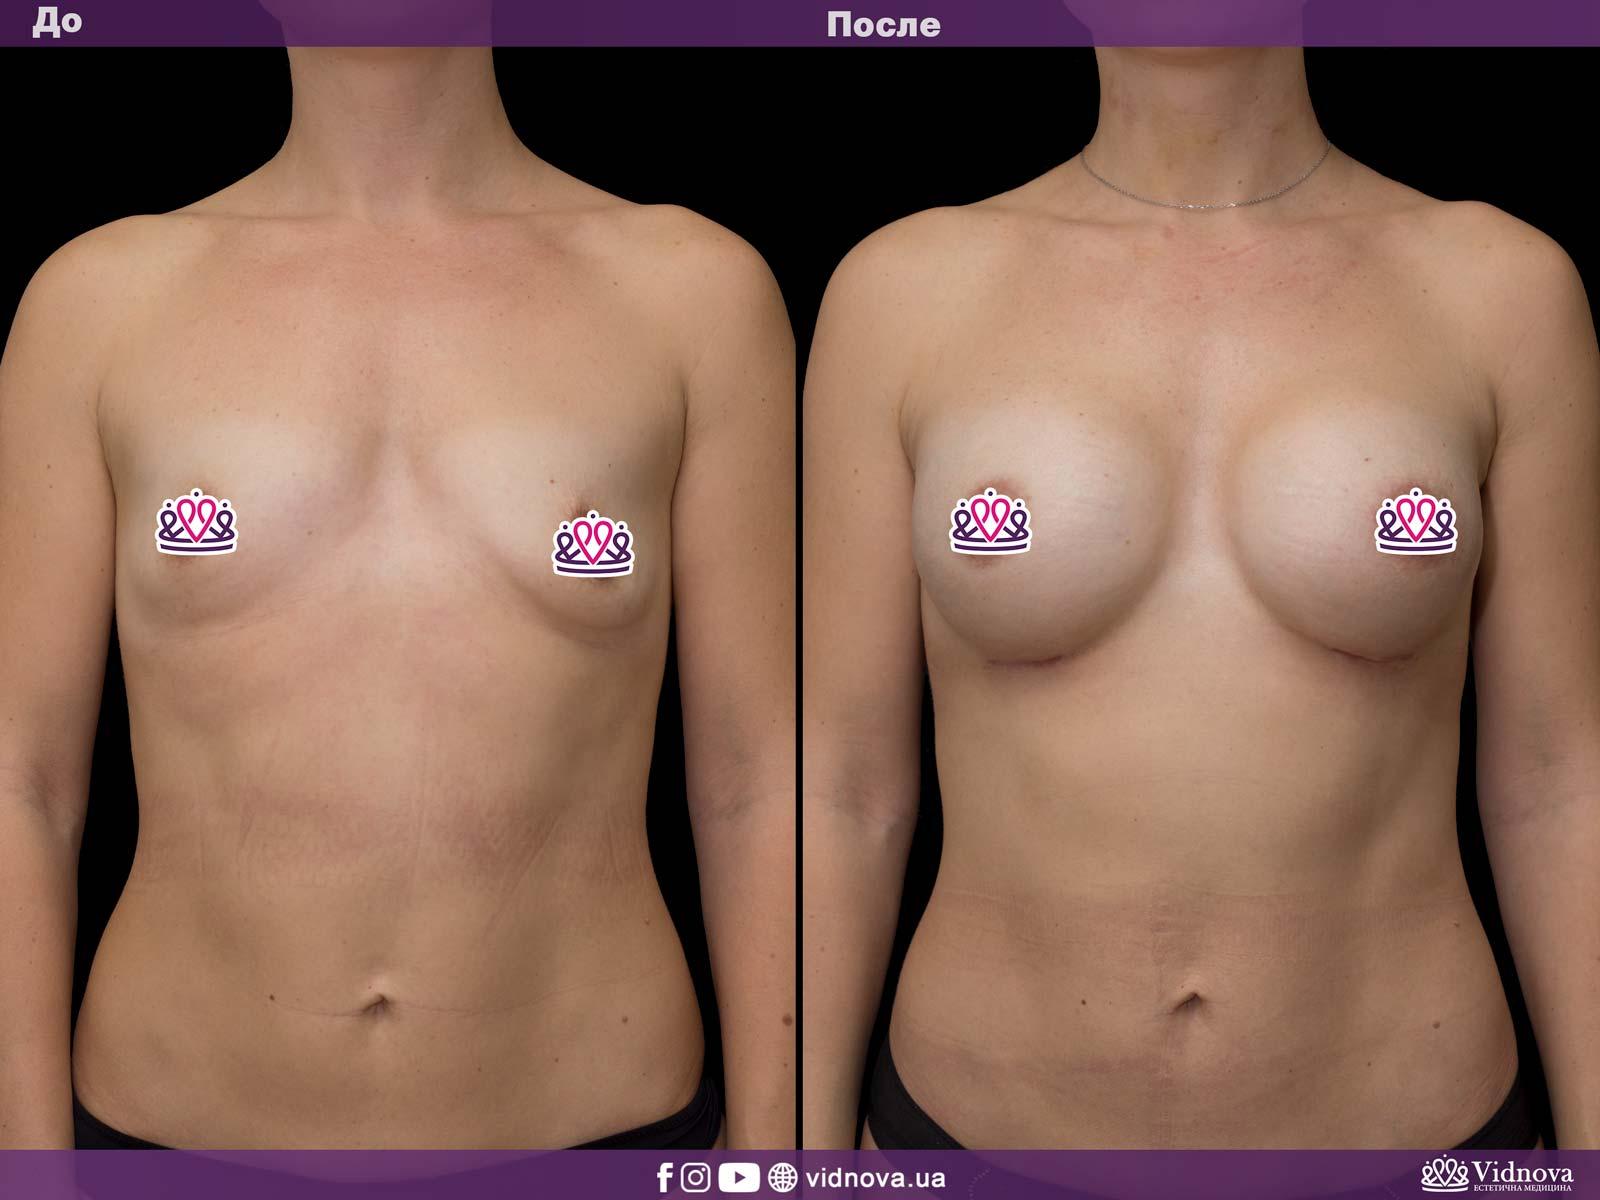 Увеличение груди: Фото ДО и ПОСЛЕ - Пример №28-1 - Клиника Vidnova